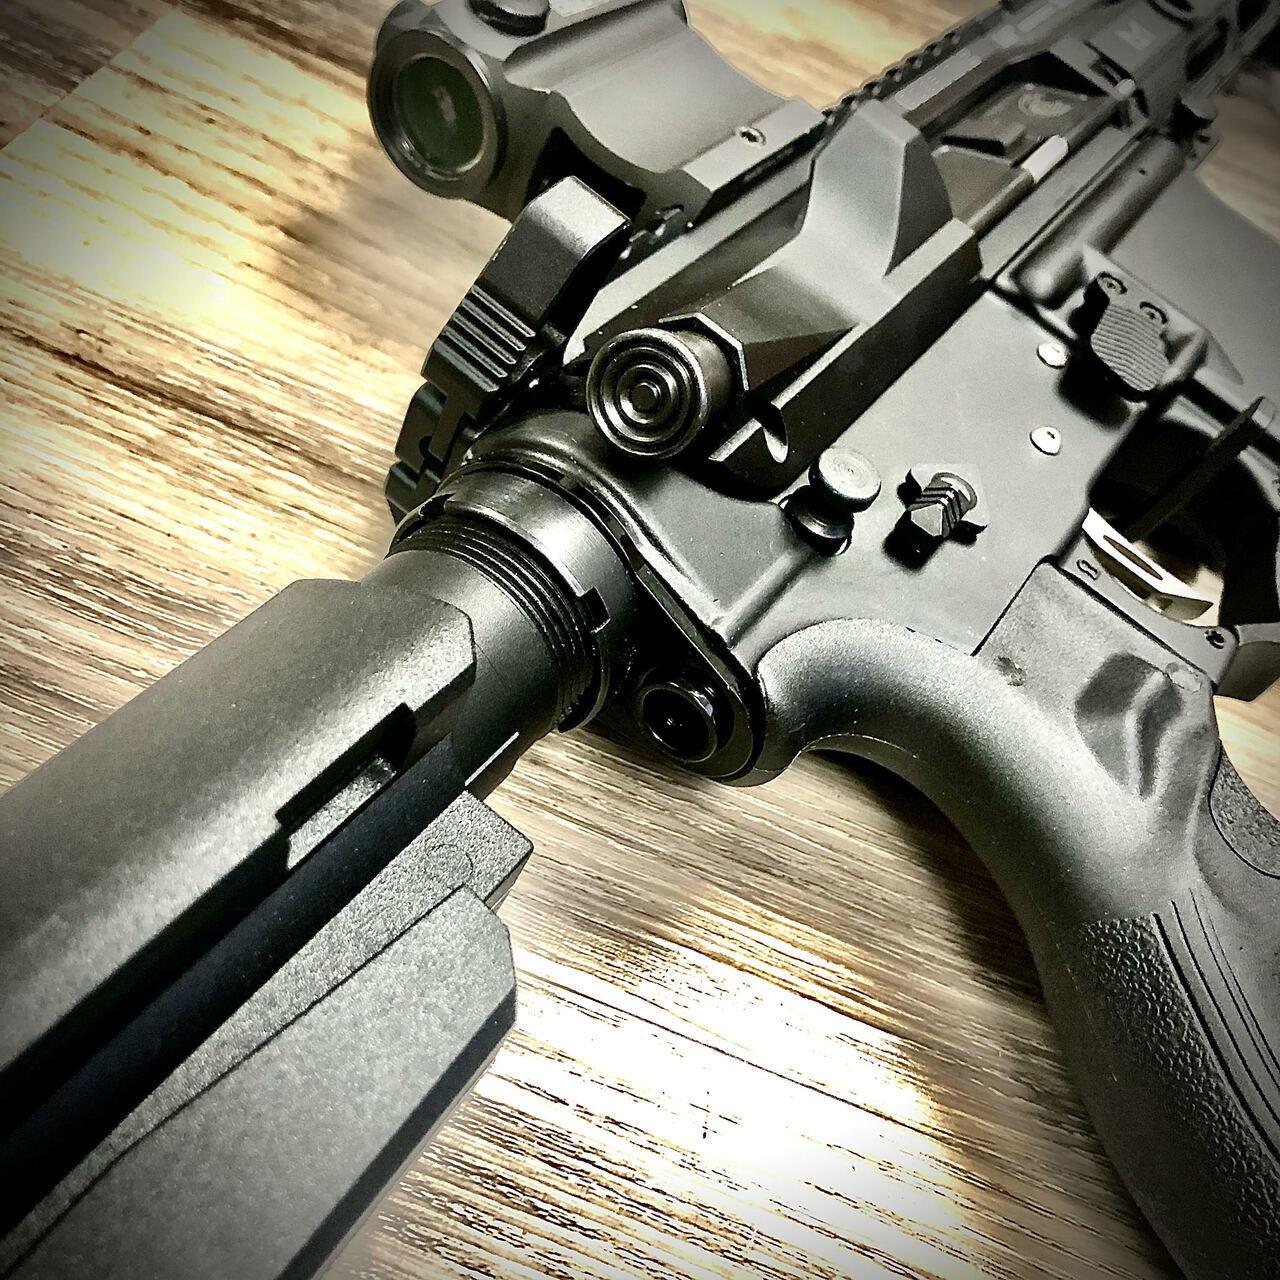 BLACK LABEL QD AR-15 End Plate - Black Label